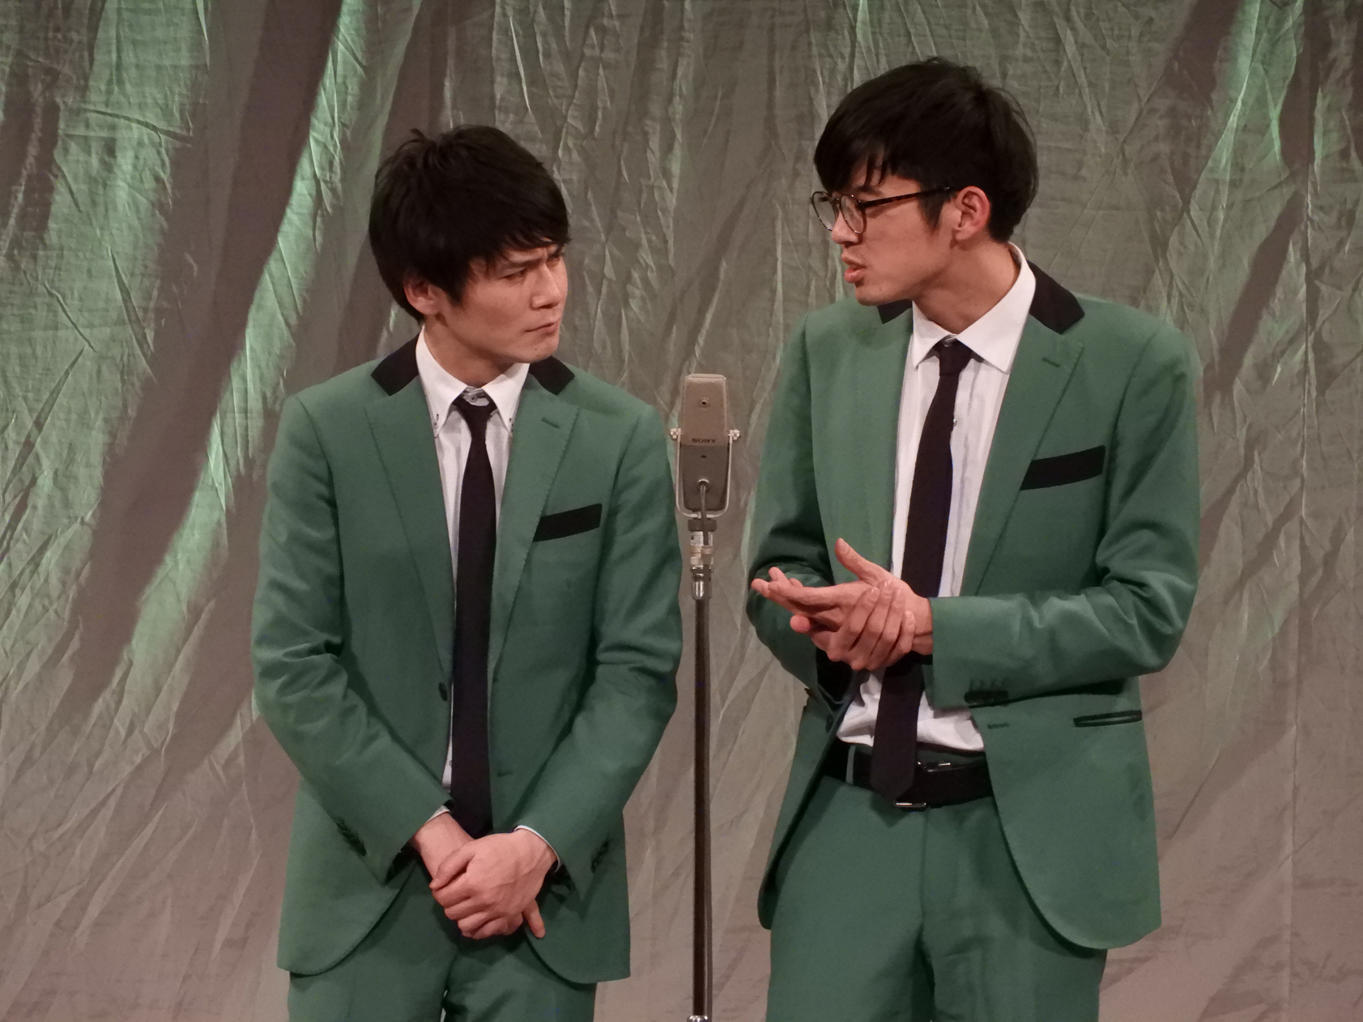 http://news.yoshimoto.co.jp/20180204153415-c2aaa1521230785ff7eae7b733c3bf5b73c0e9a1.jpg